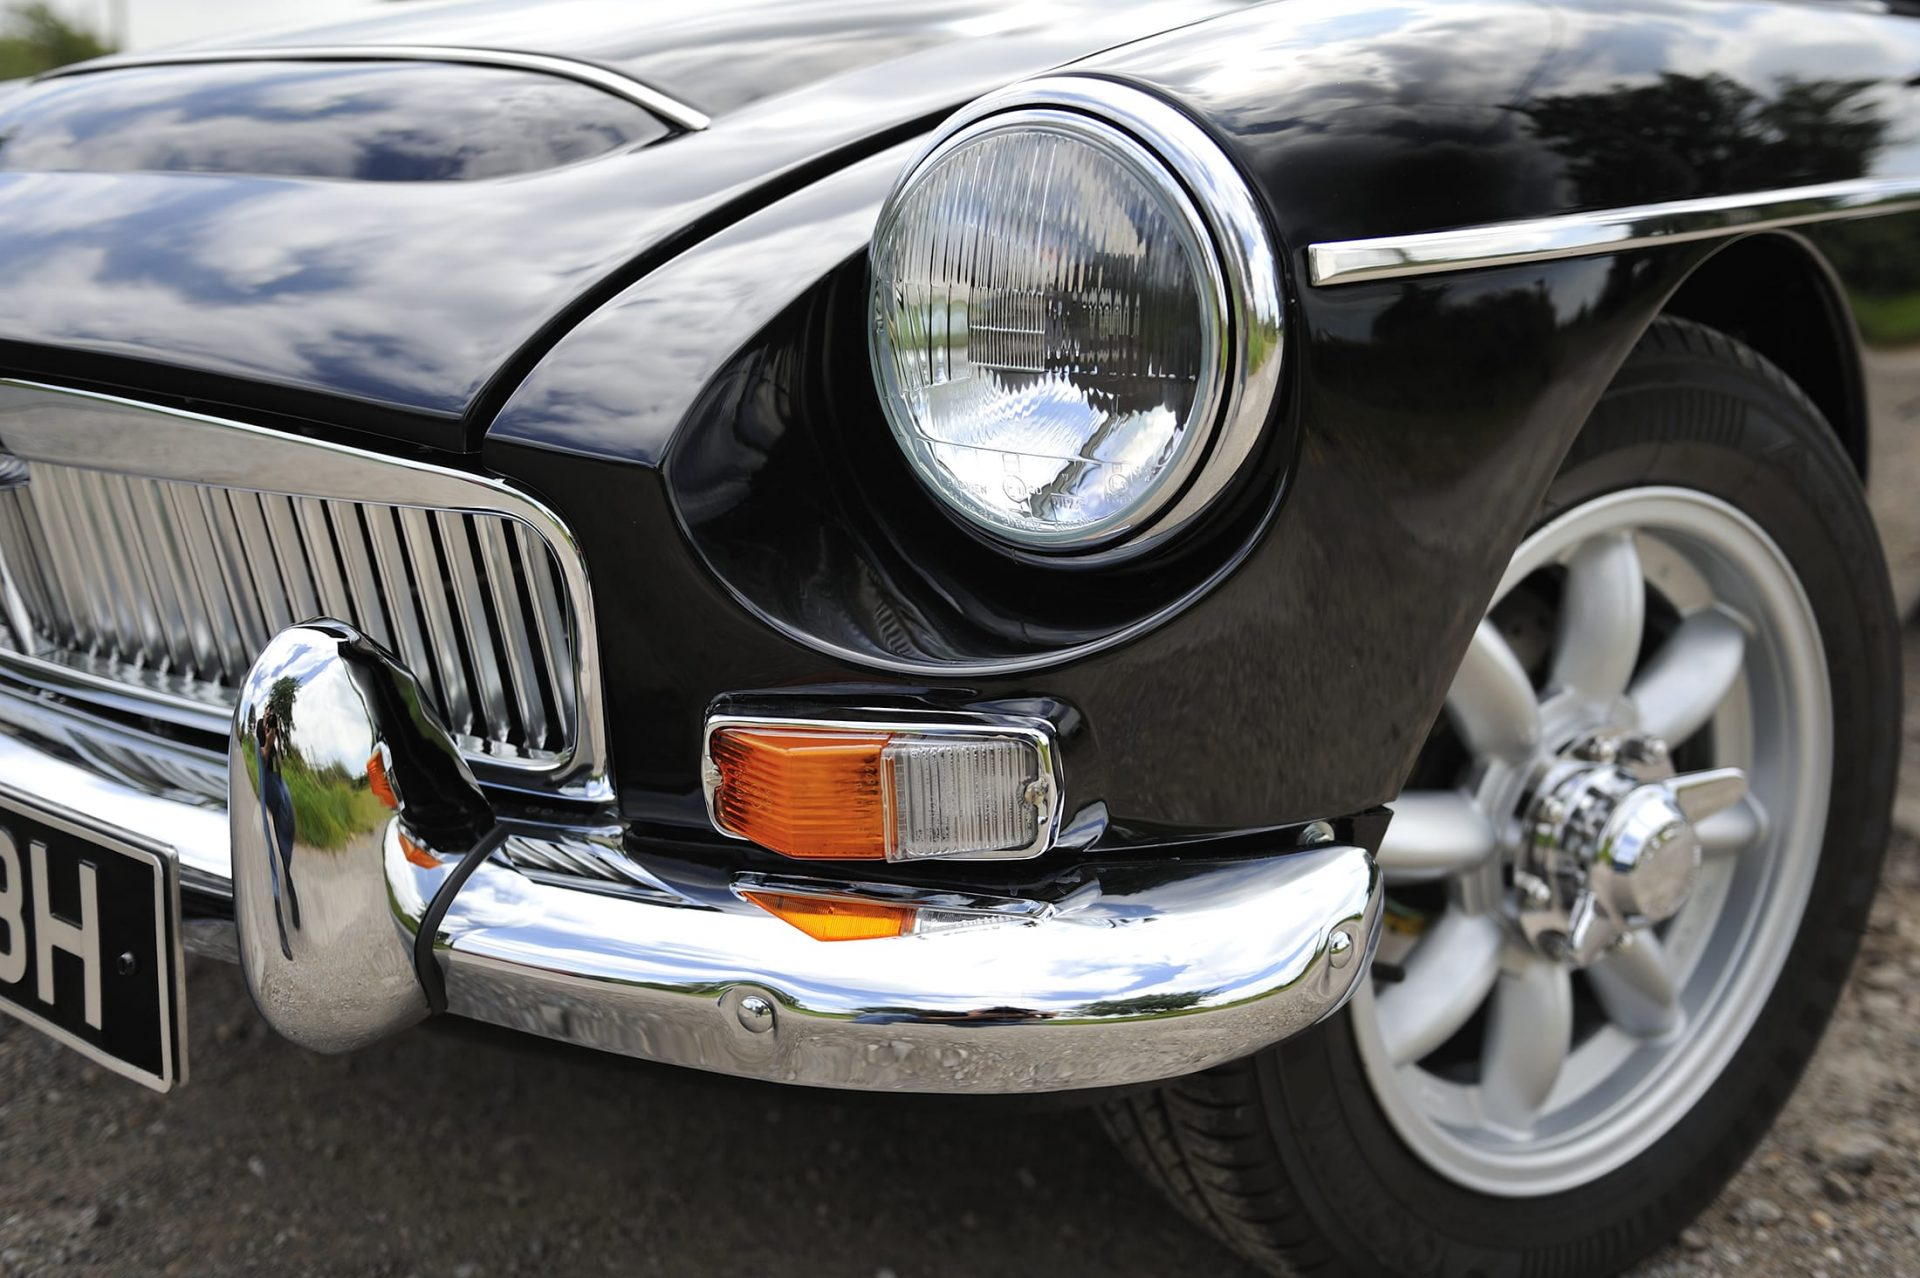 Black MG classic car